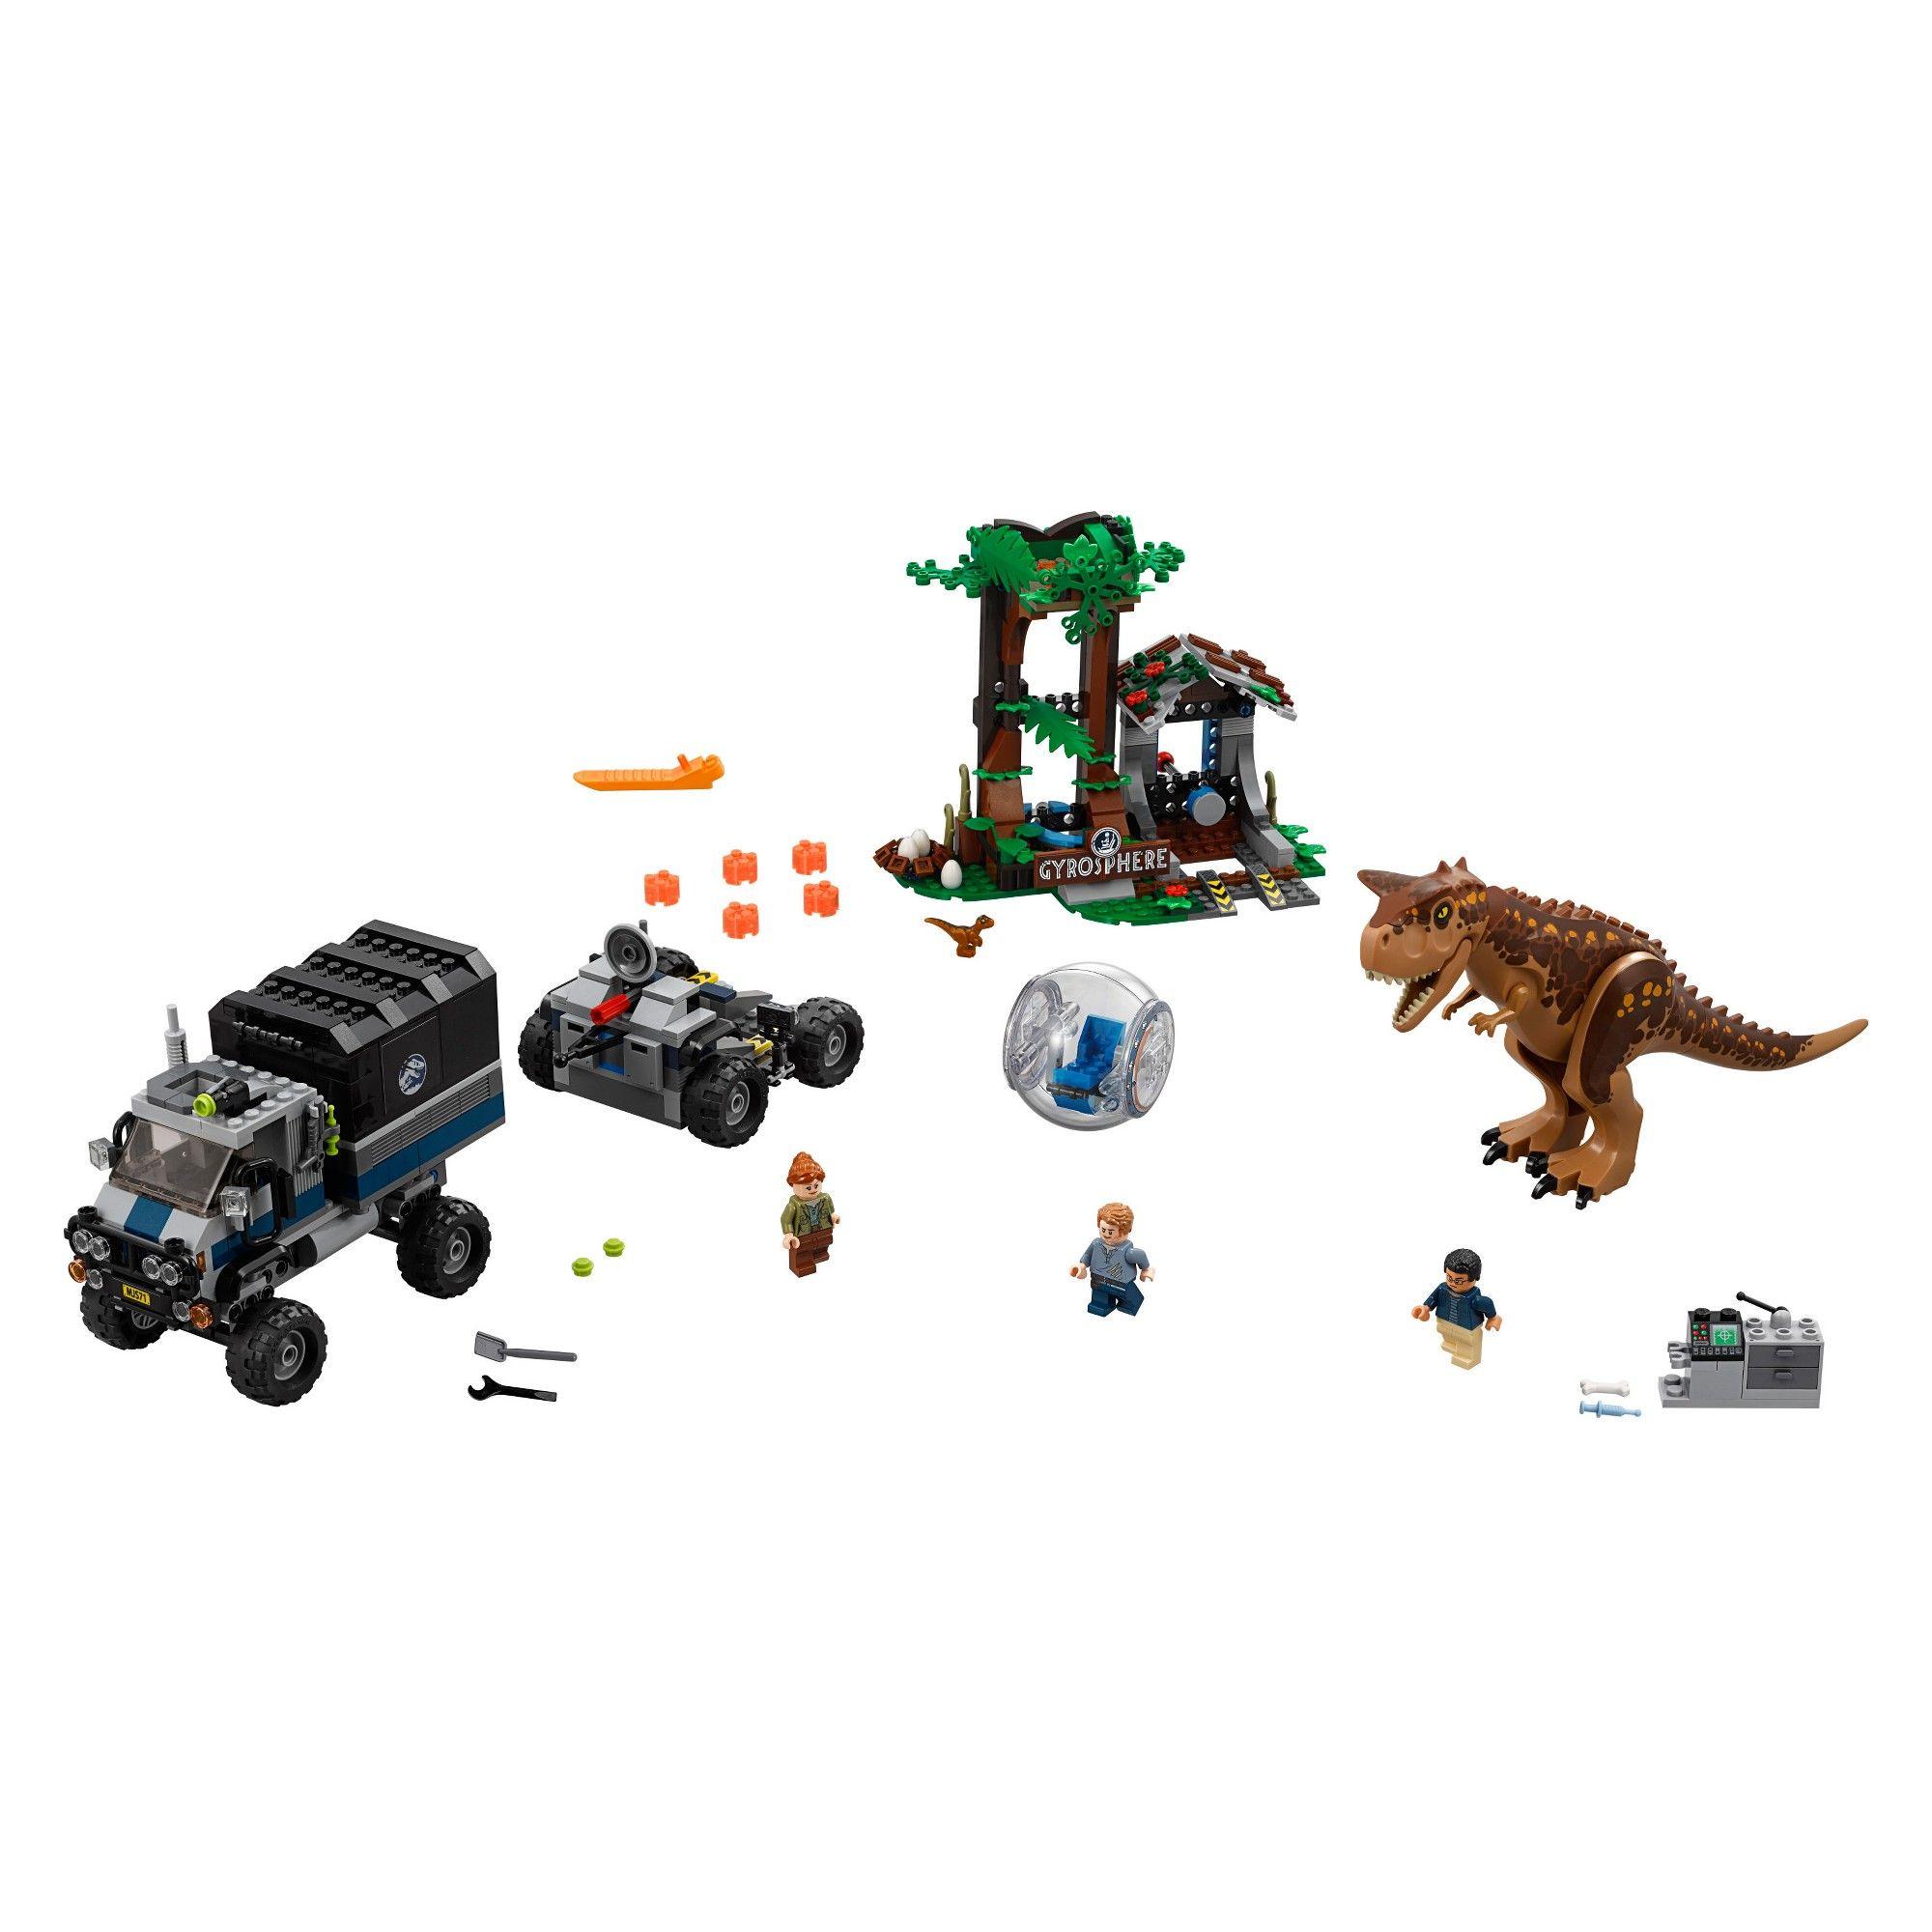 LEGO Jurassic World Carnotaurus Dino Minifigure 75929 Dinosaur Fallen Kingdom Mi